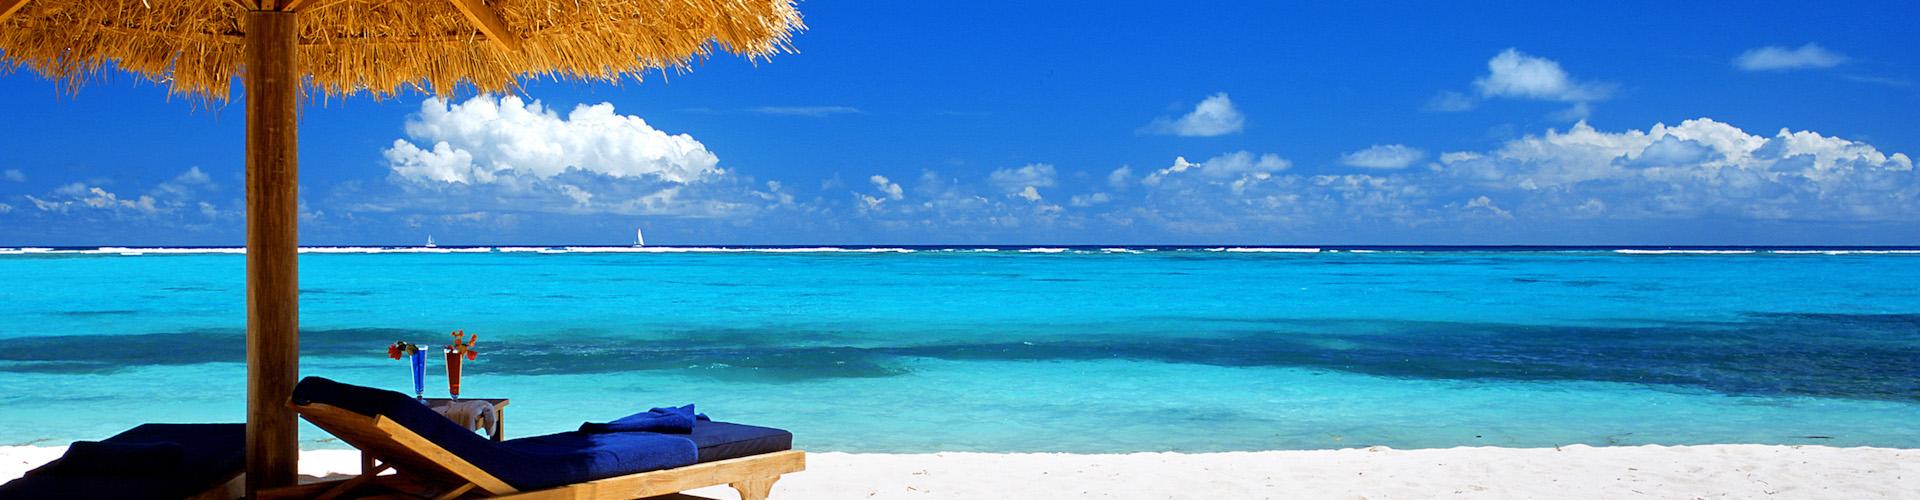 Virgin Islands Flights From Nyc